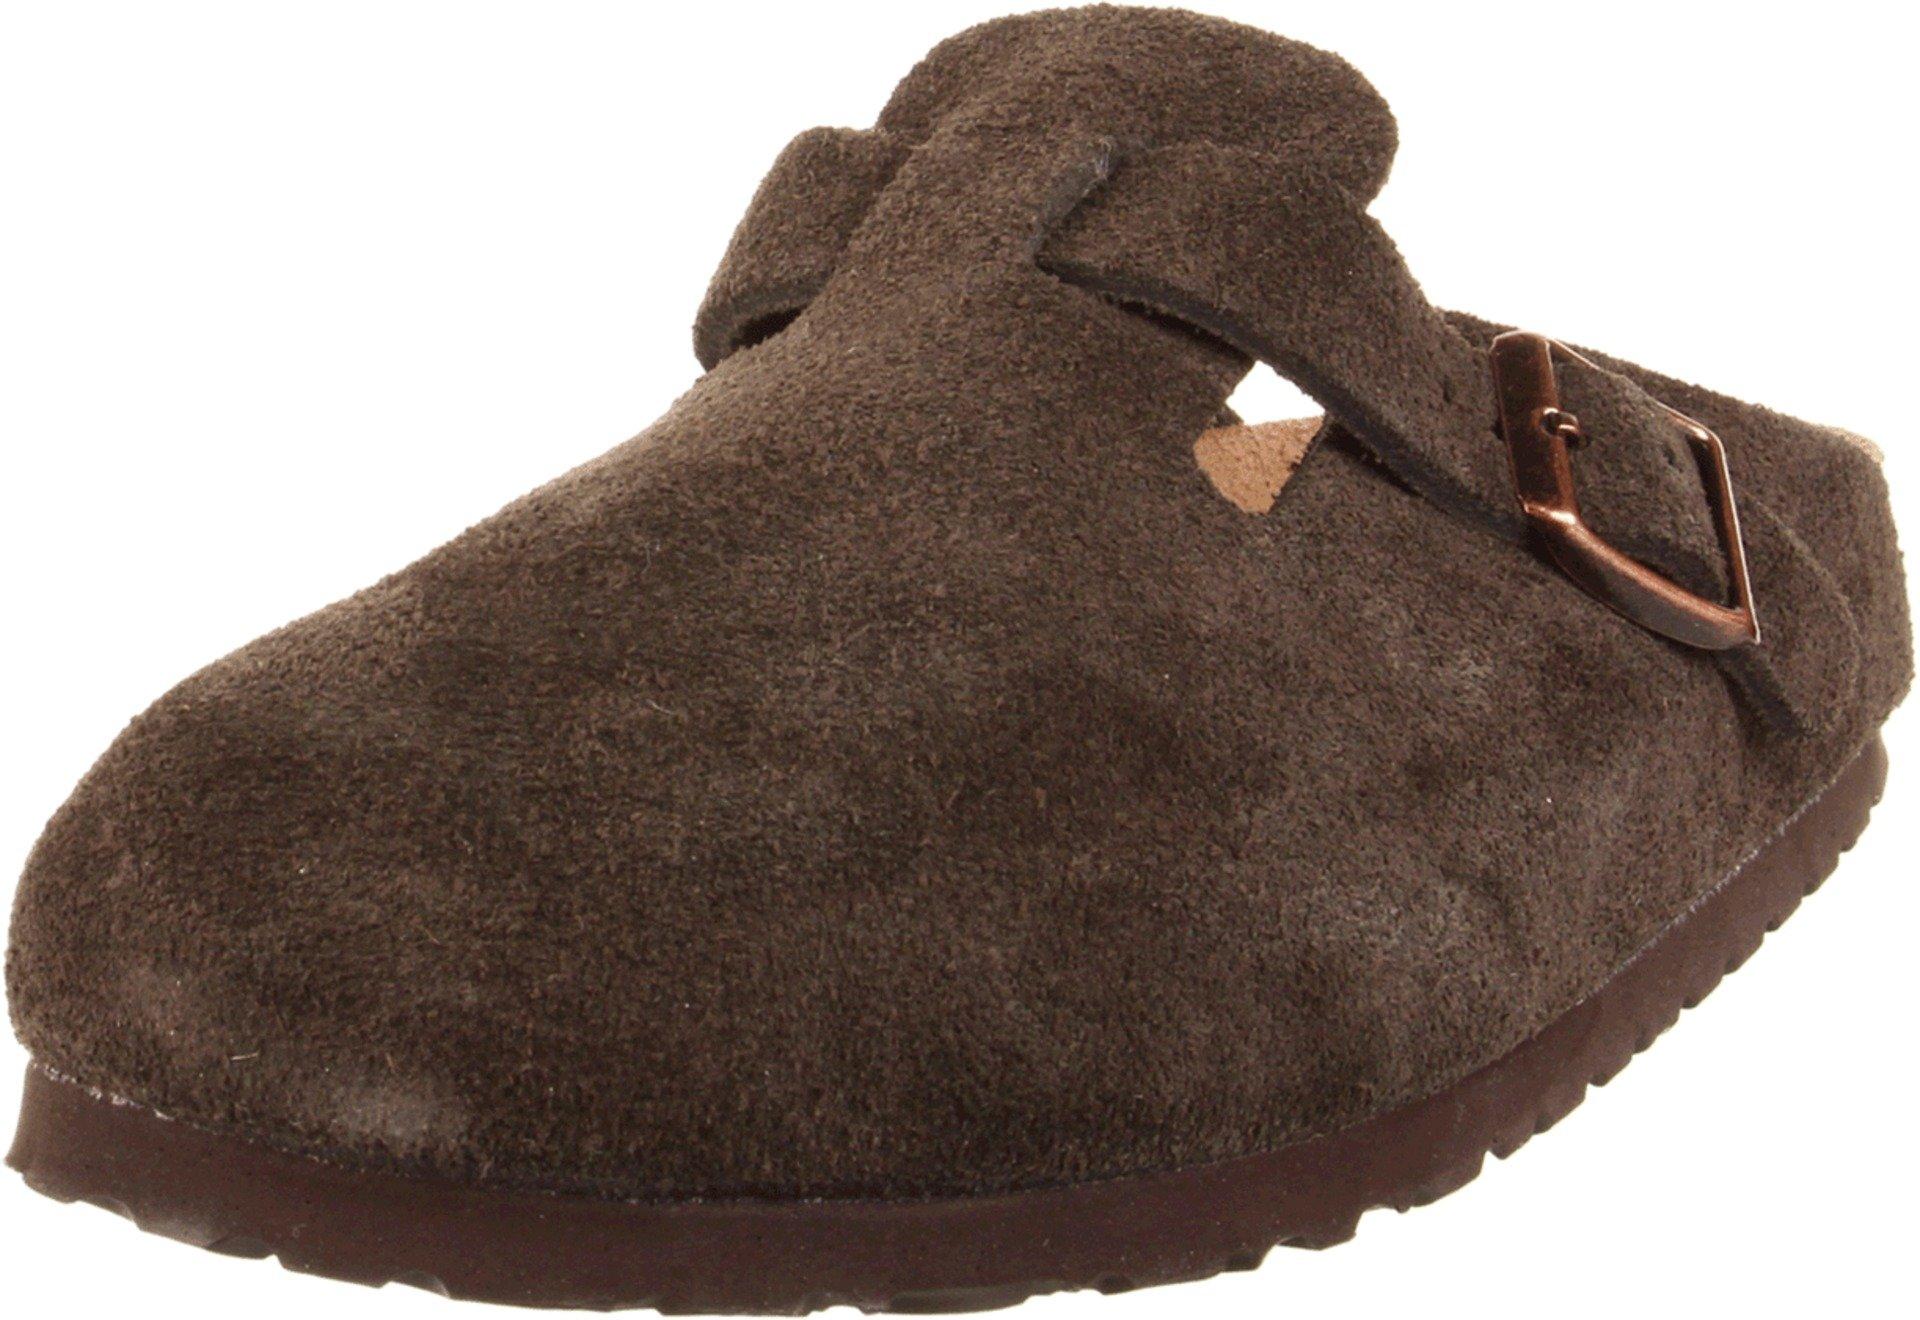 Birkenstock Unisex Boston Soft Footbed, Mocha Suede, 40 N EU